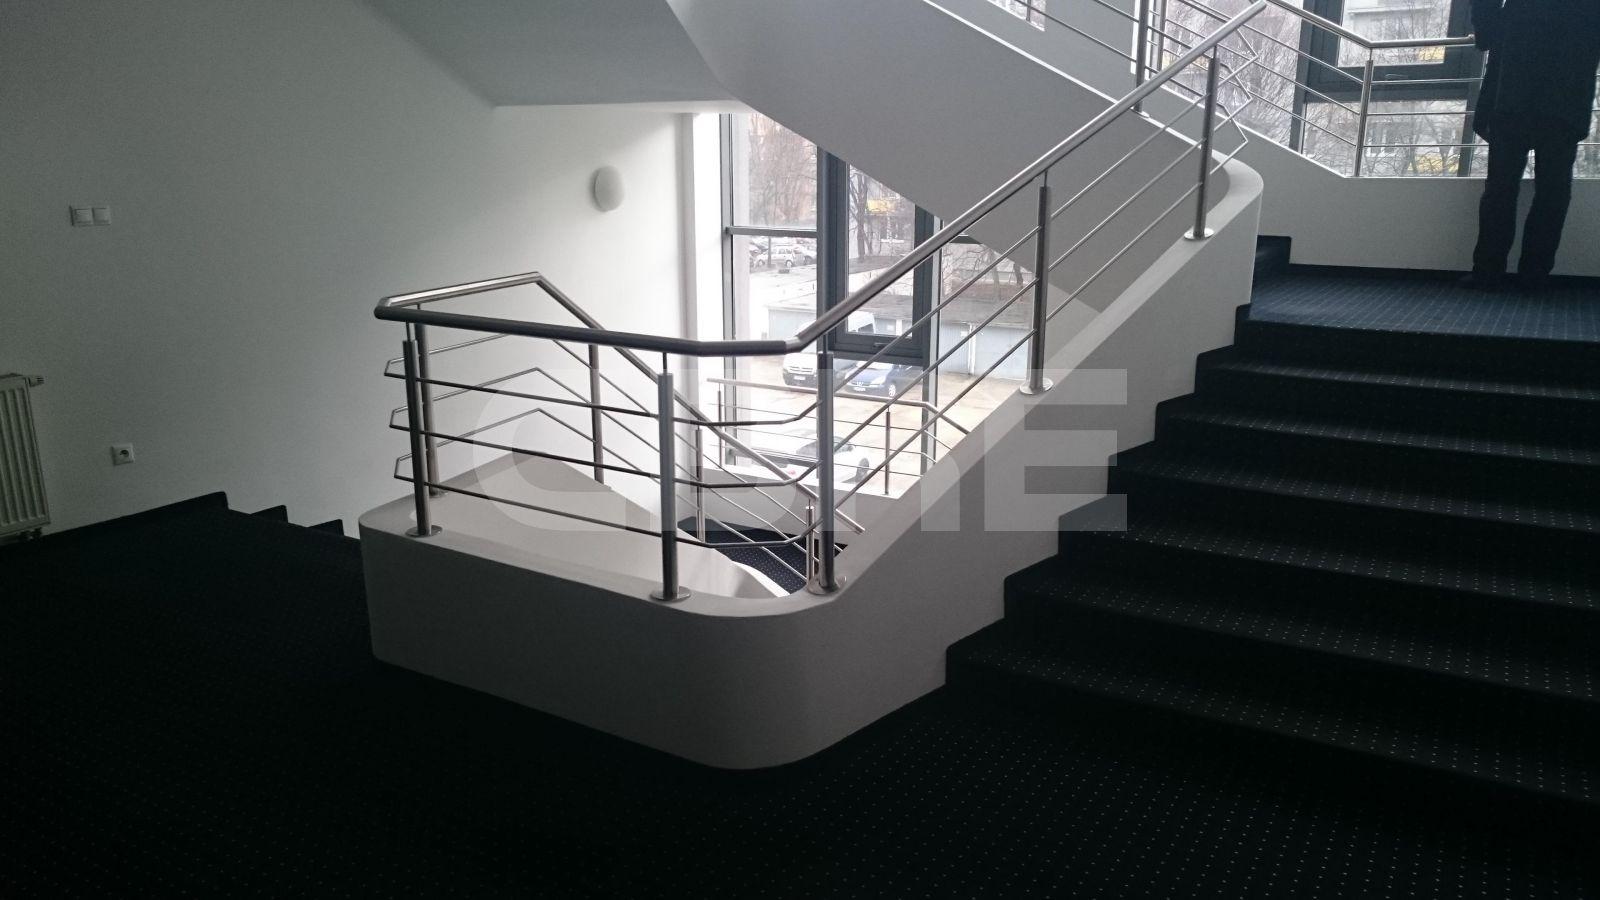 Aston - Bajkalská 22, Bratislava - Ružinov | Offices for rent by CBRE | 2